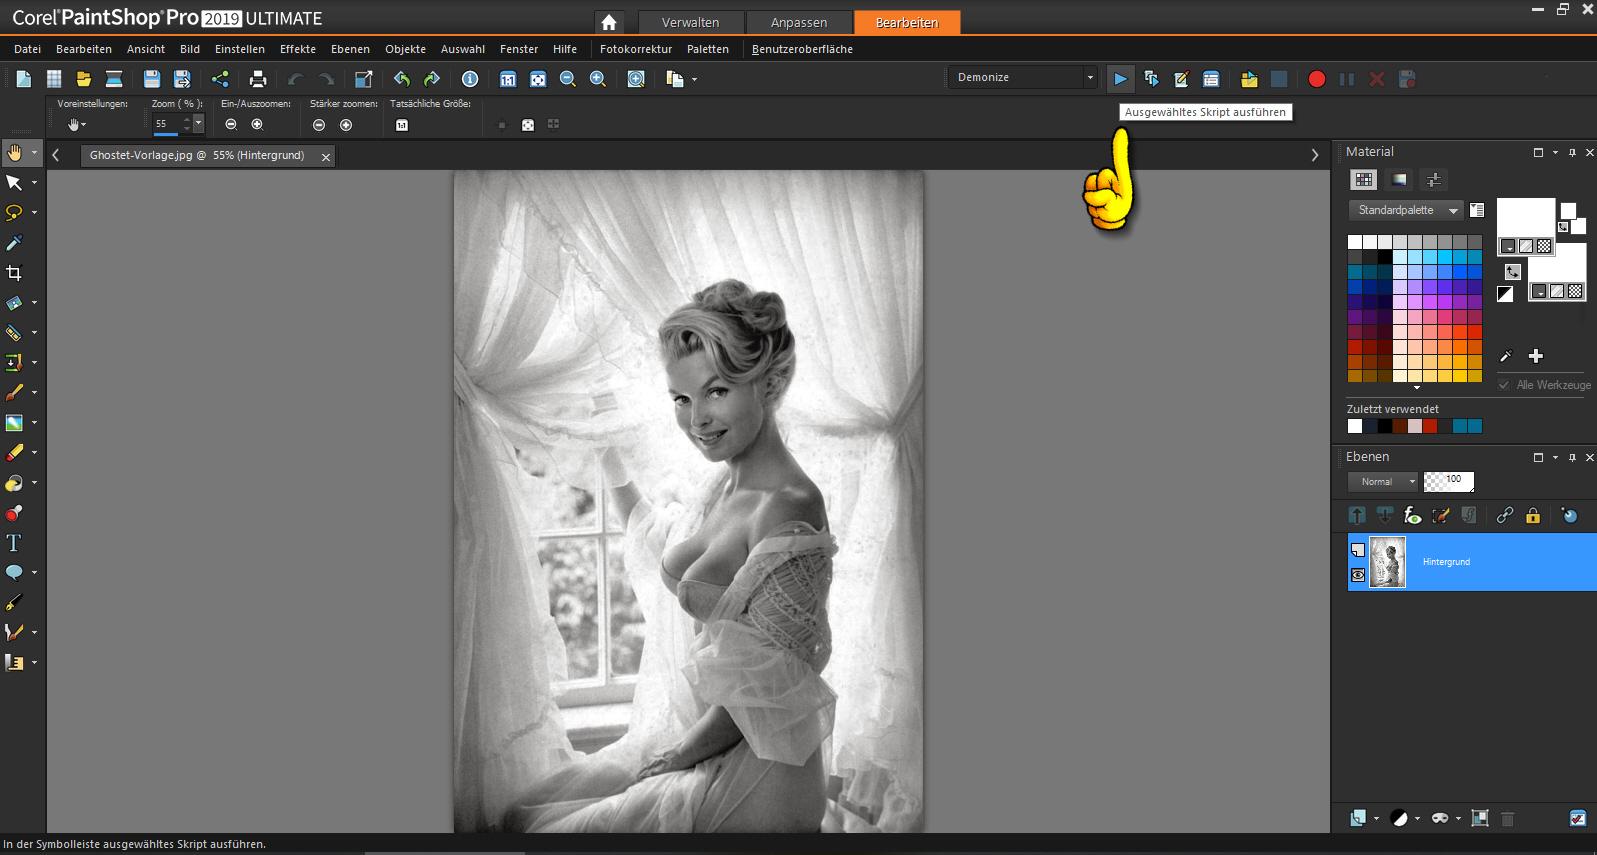 Skript-Menü in PaintShop Pro